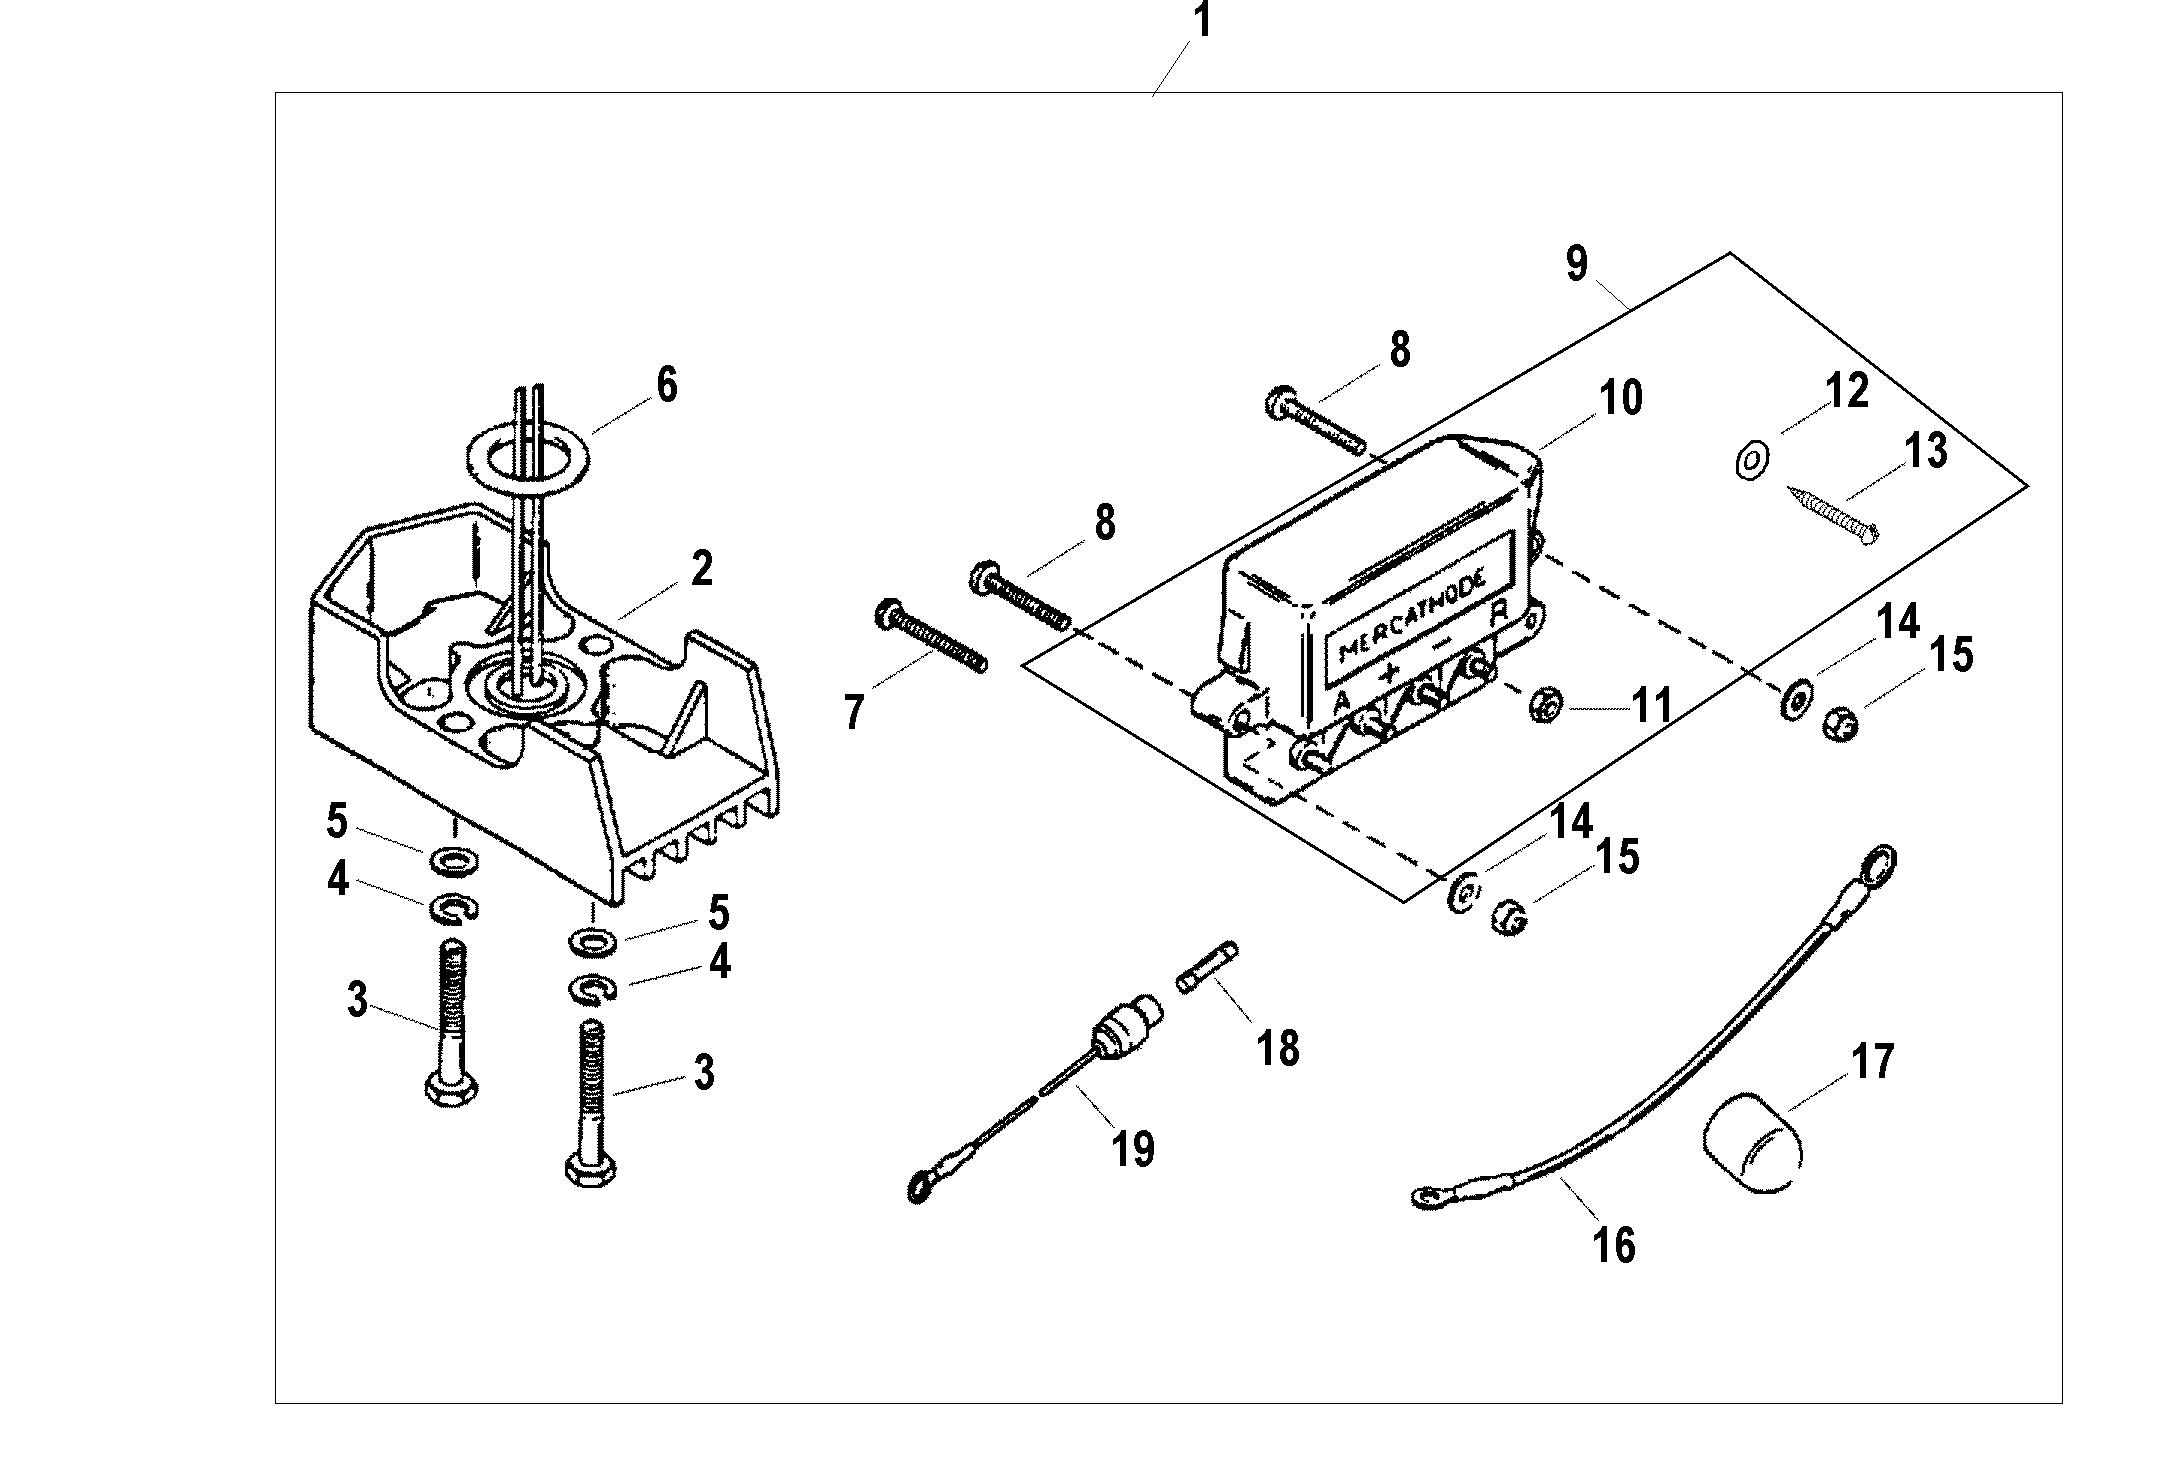 Mercathode Kit A14 For Fuel Tanks Fuel Lines